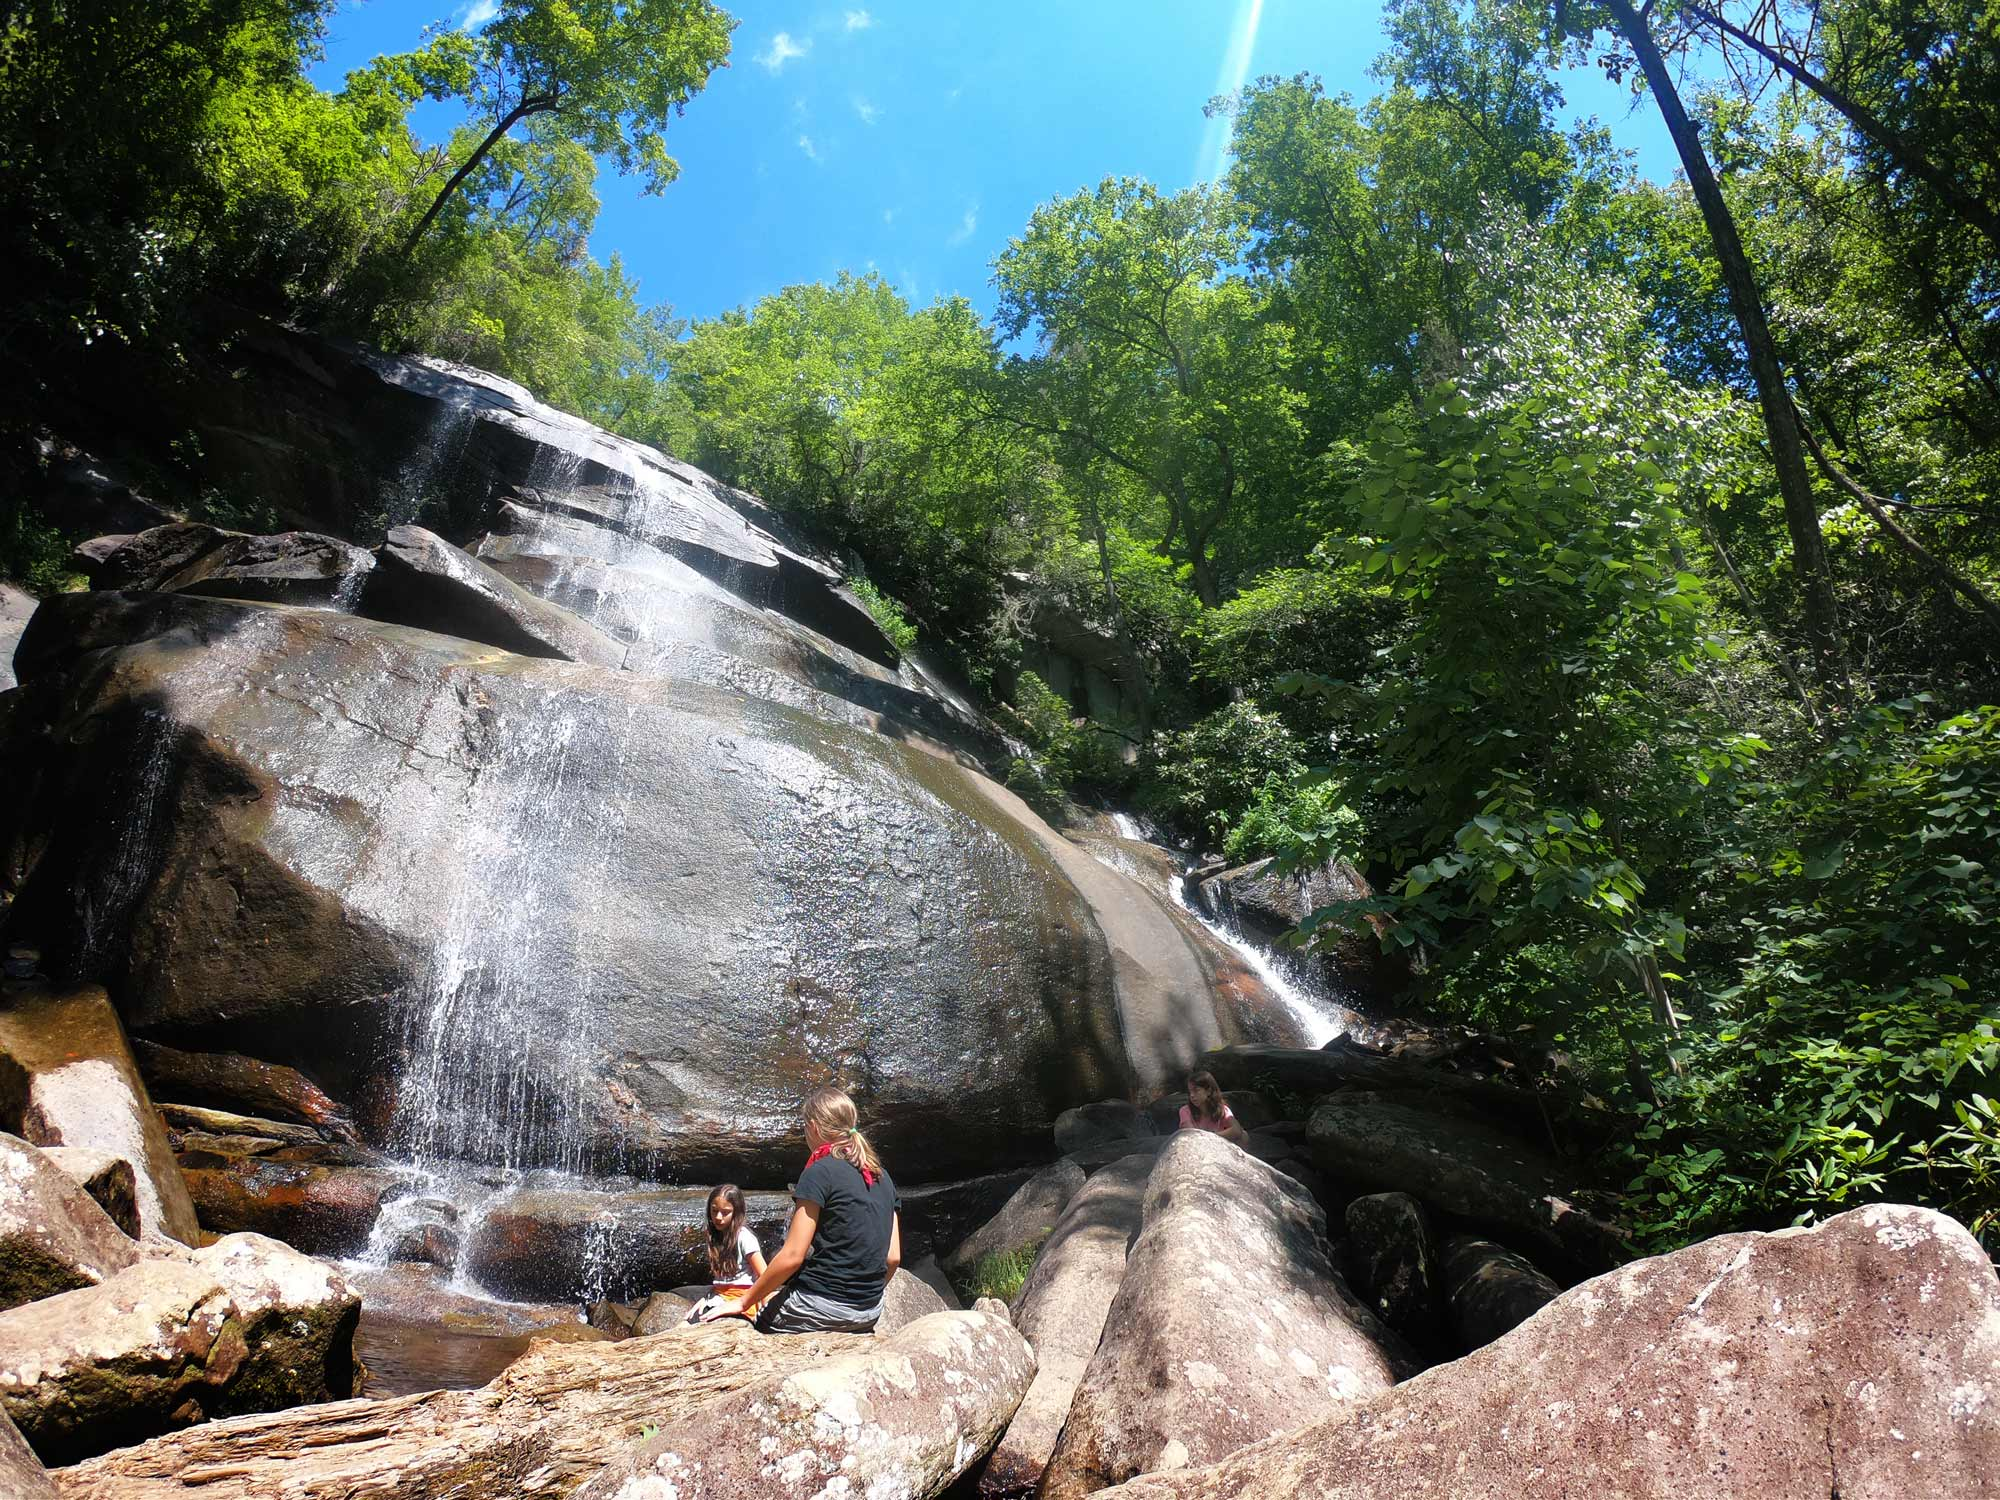 Two girls wading at the base of Daniel Ridge Falls in Pisgah National Forest, North Carolina